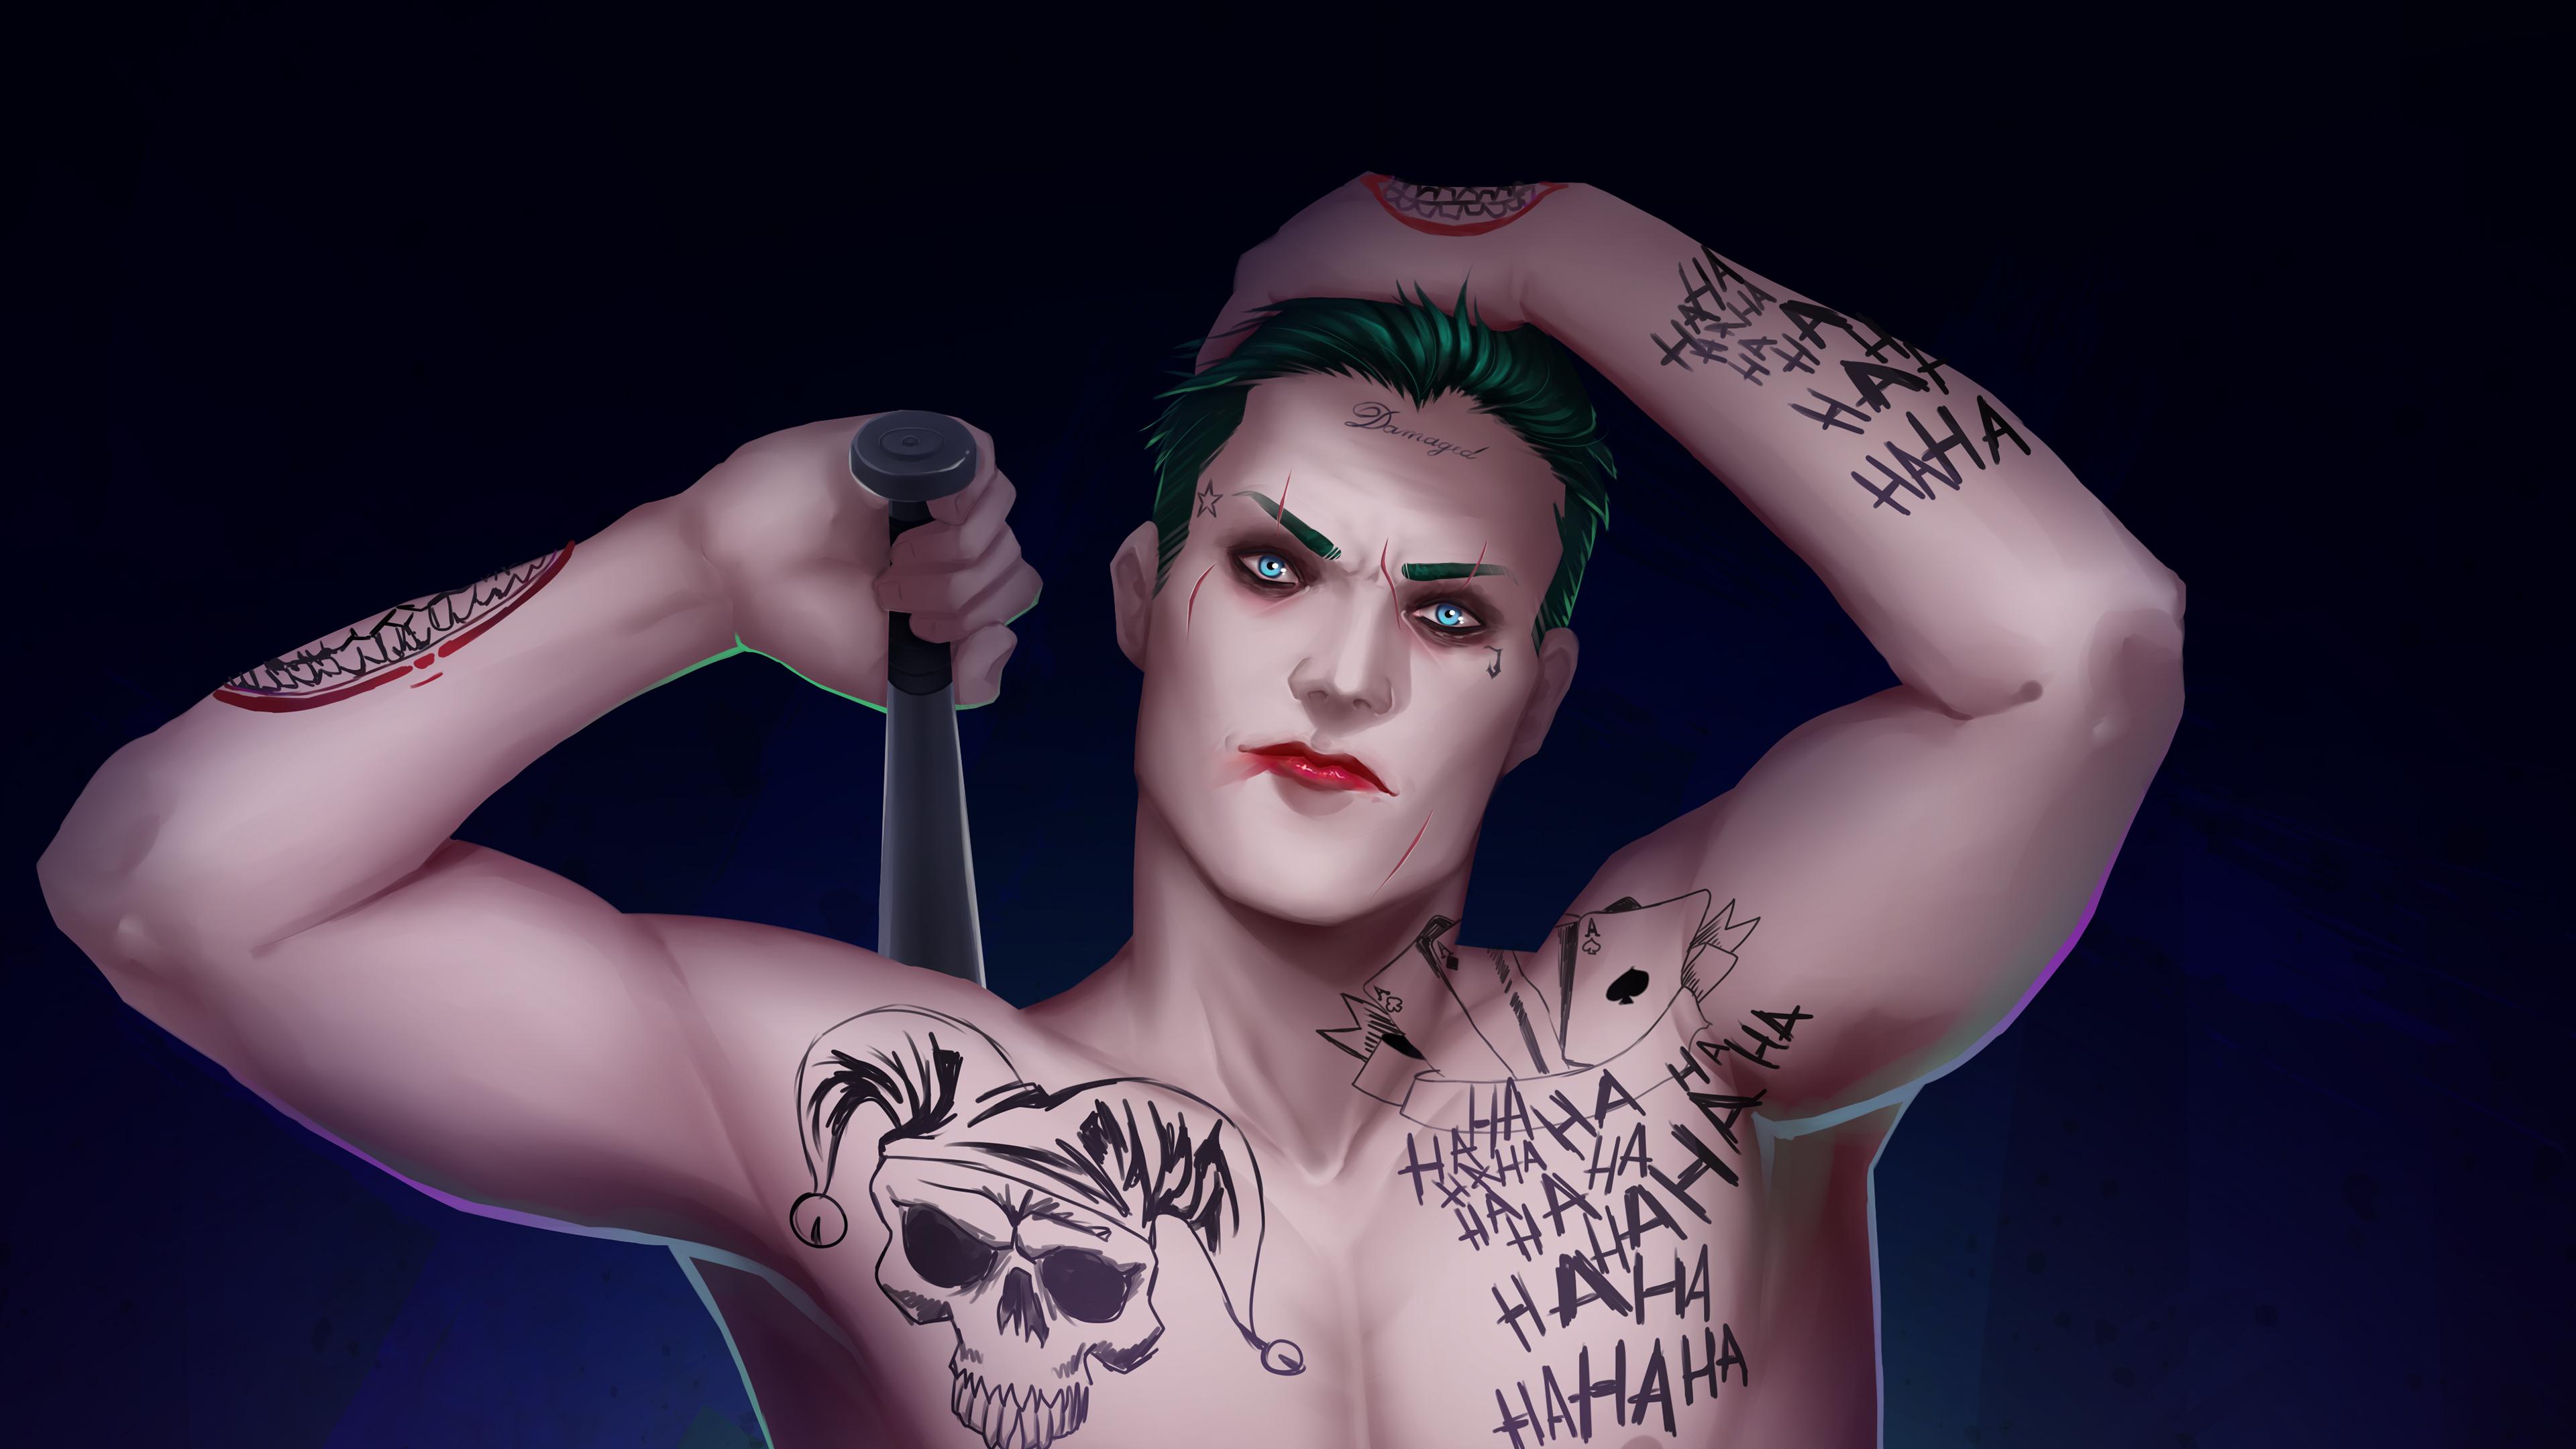 joker digital artwork 4k 1547506295 - Joker Digital Artwork 4k - supervillain wallpapers, superheroes wallpapers, joker wallpapers, hd-wallpapers, digital art wallpapers, artwork wallpapers, artist wallpapers, 4k-wallpapers